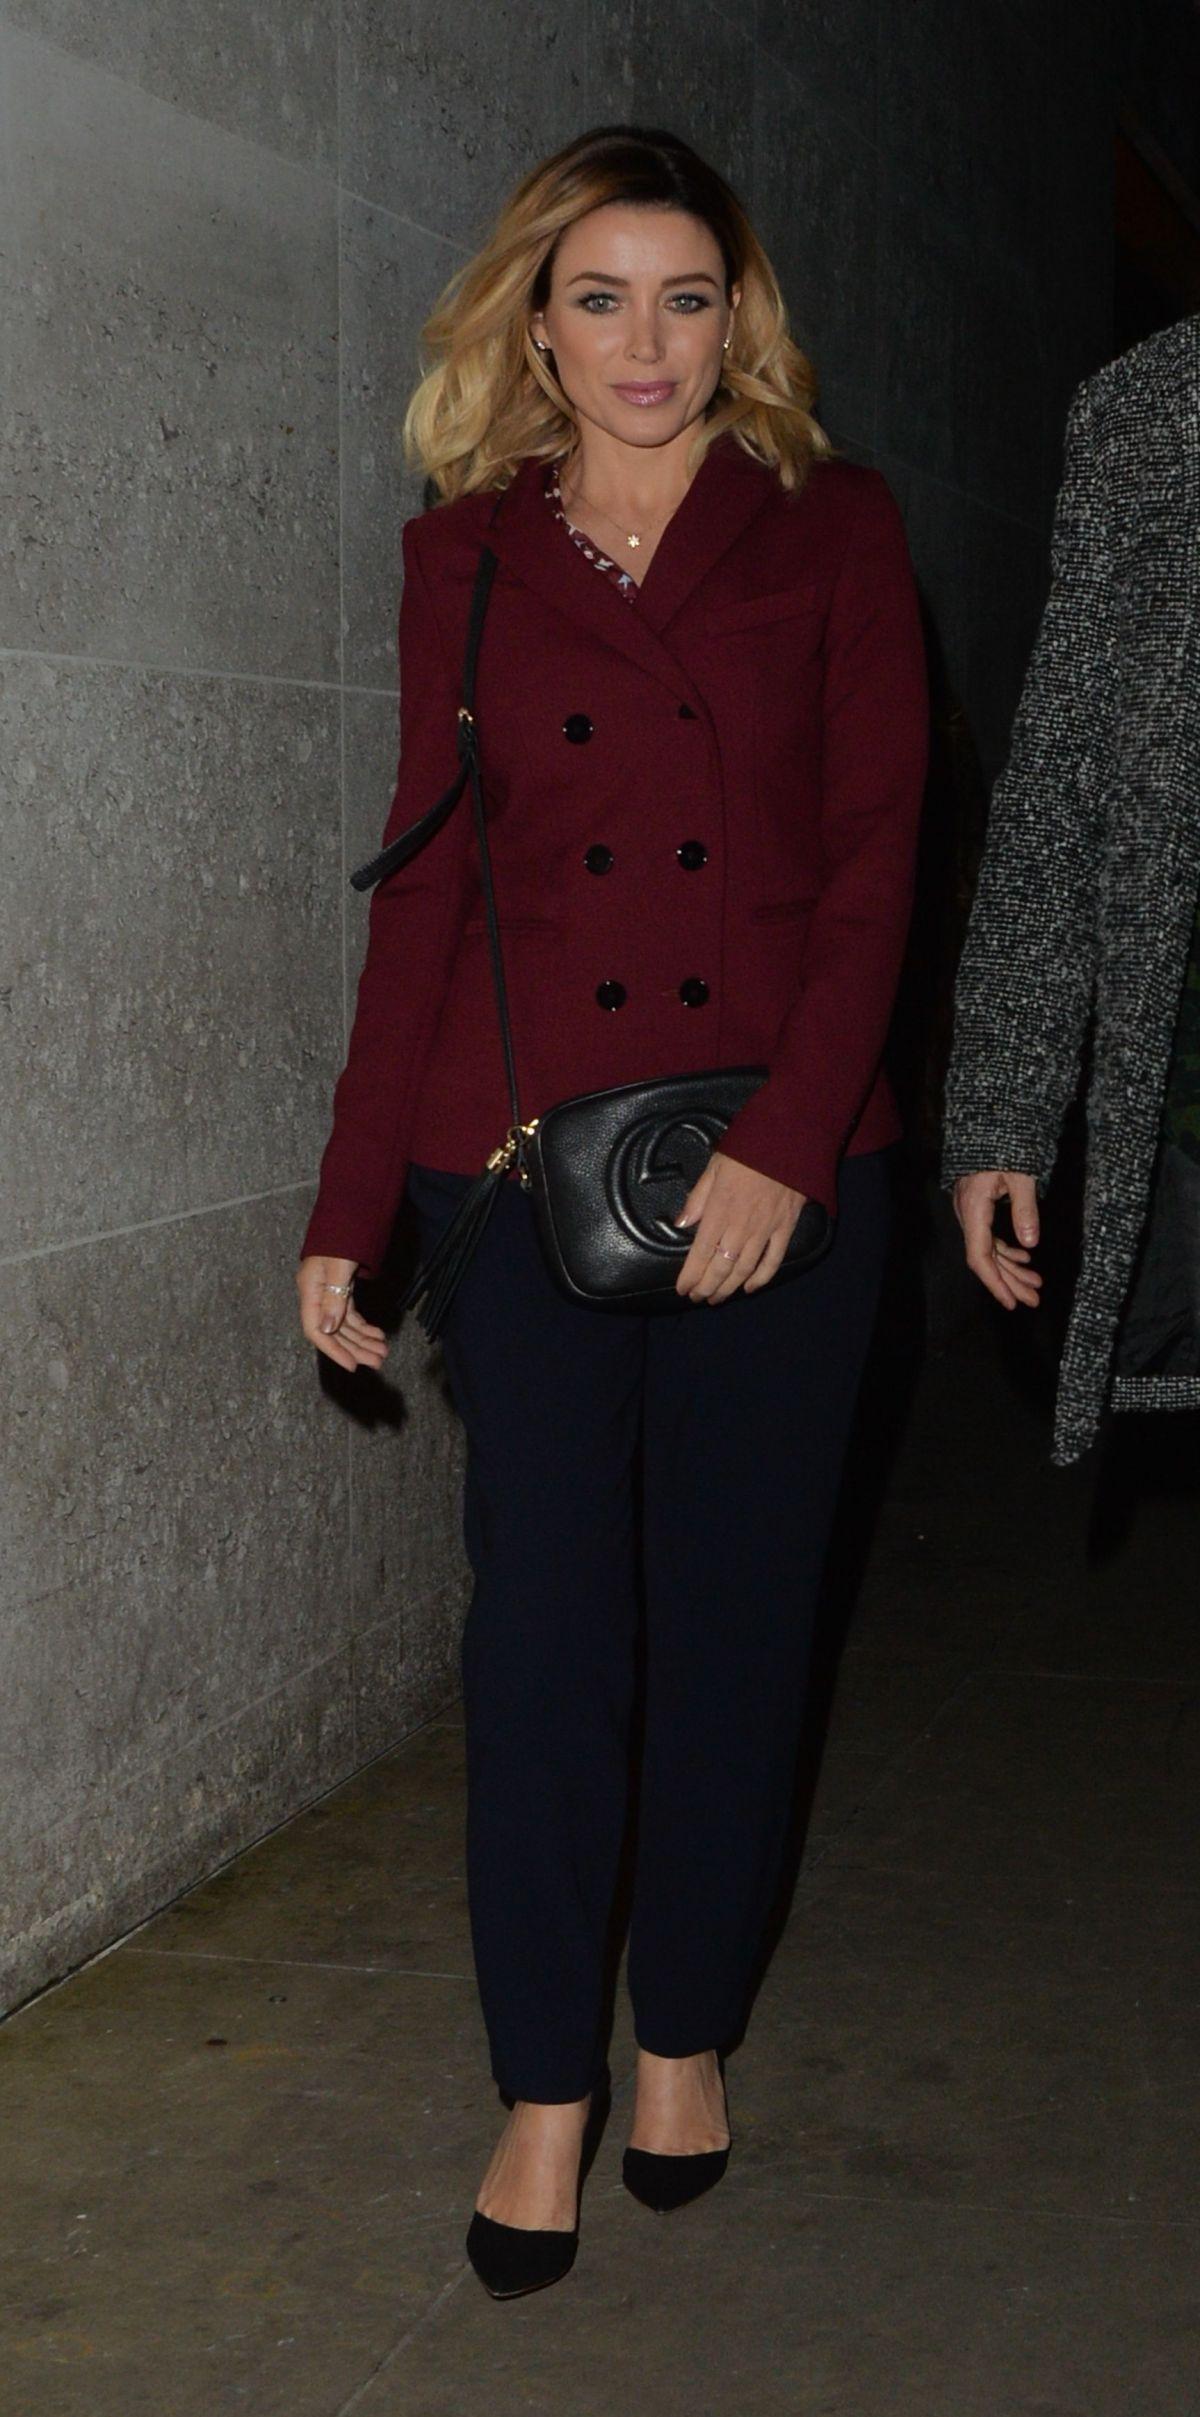 DANNII MINOGUE Leaves BBC Studios in London 02/08/2017